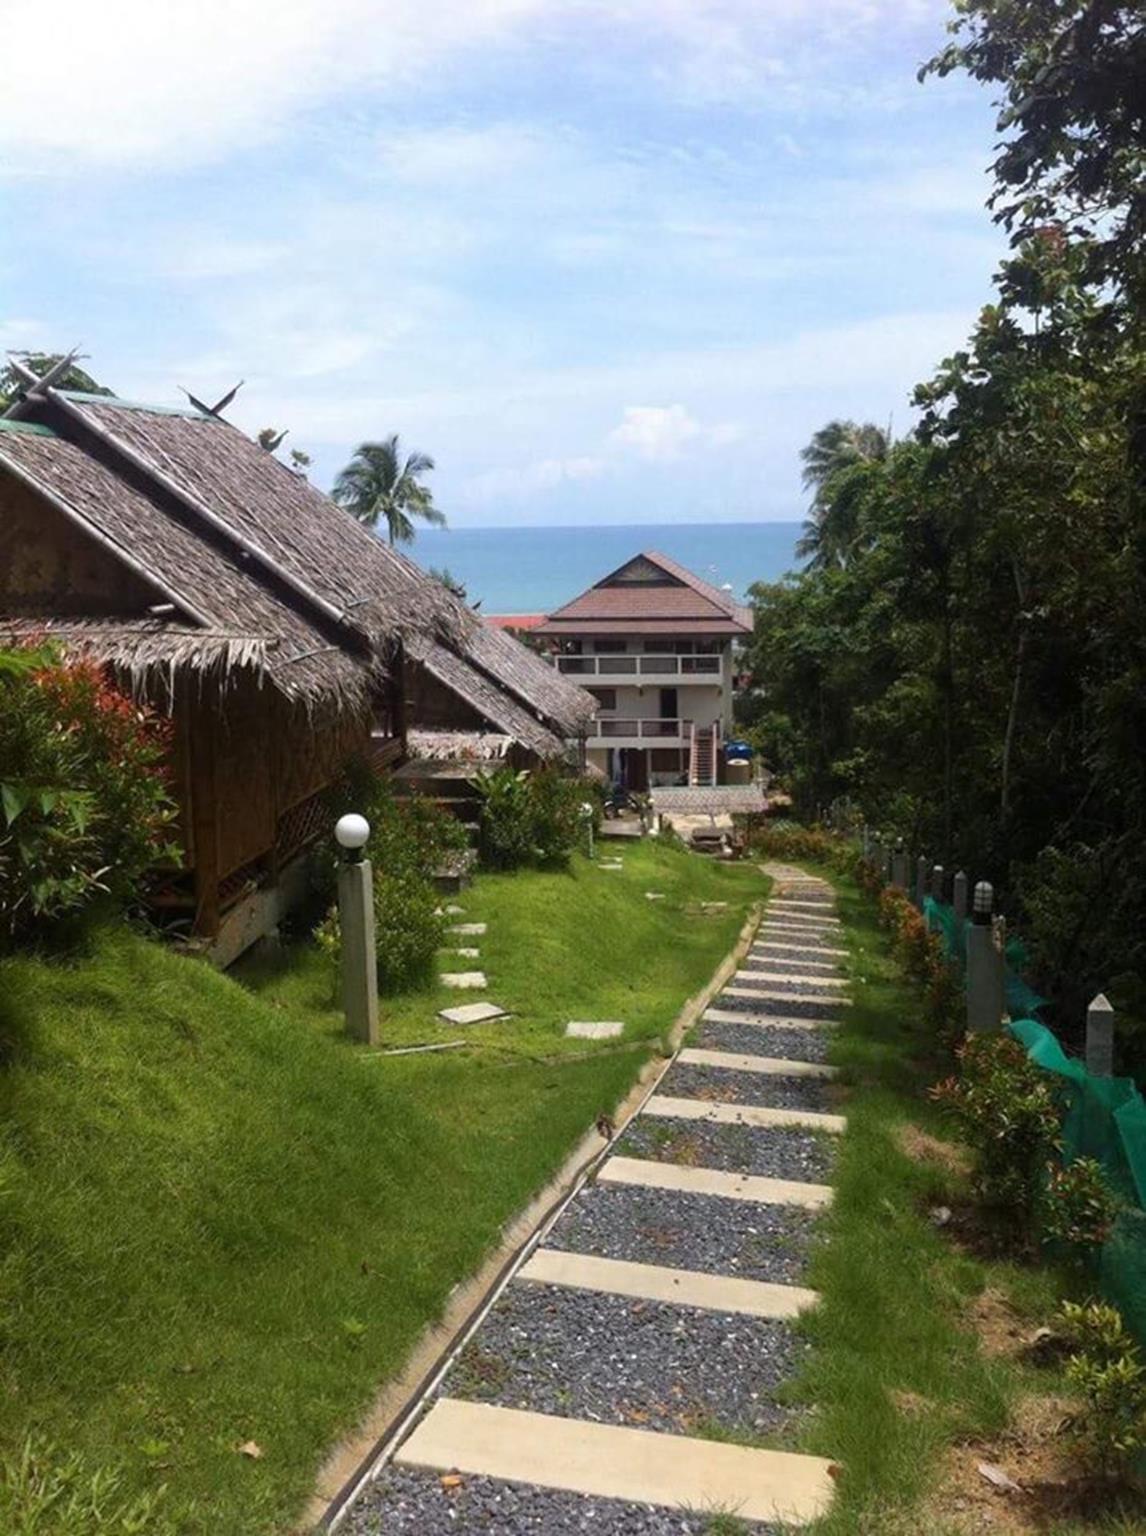 Amada cara bungalow อมาดา คารา บังกะโล